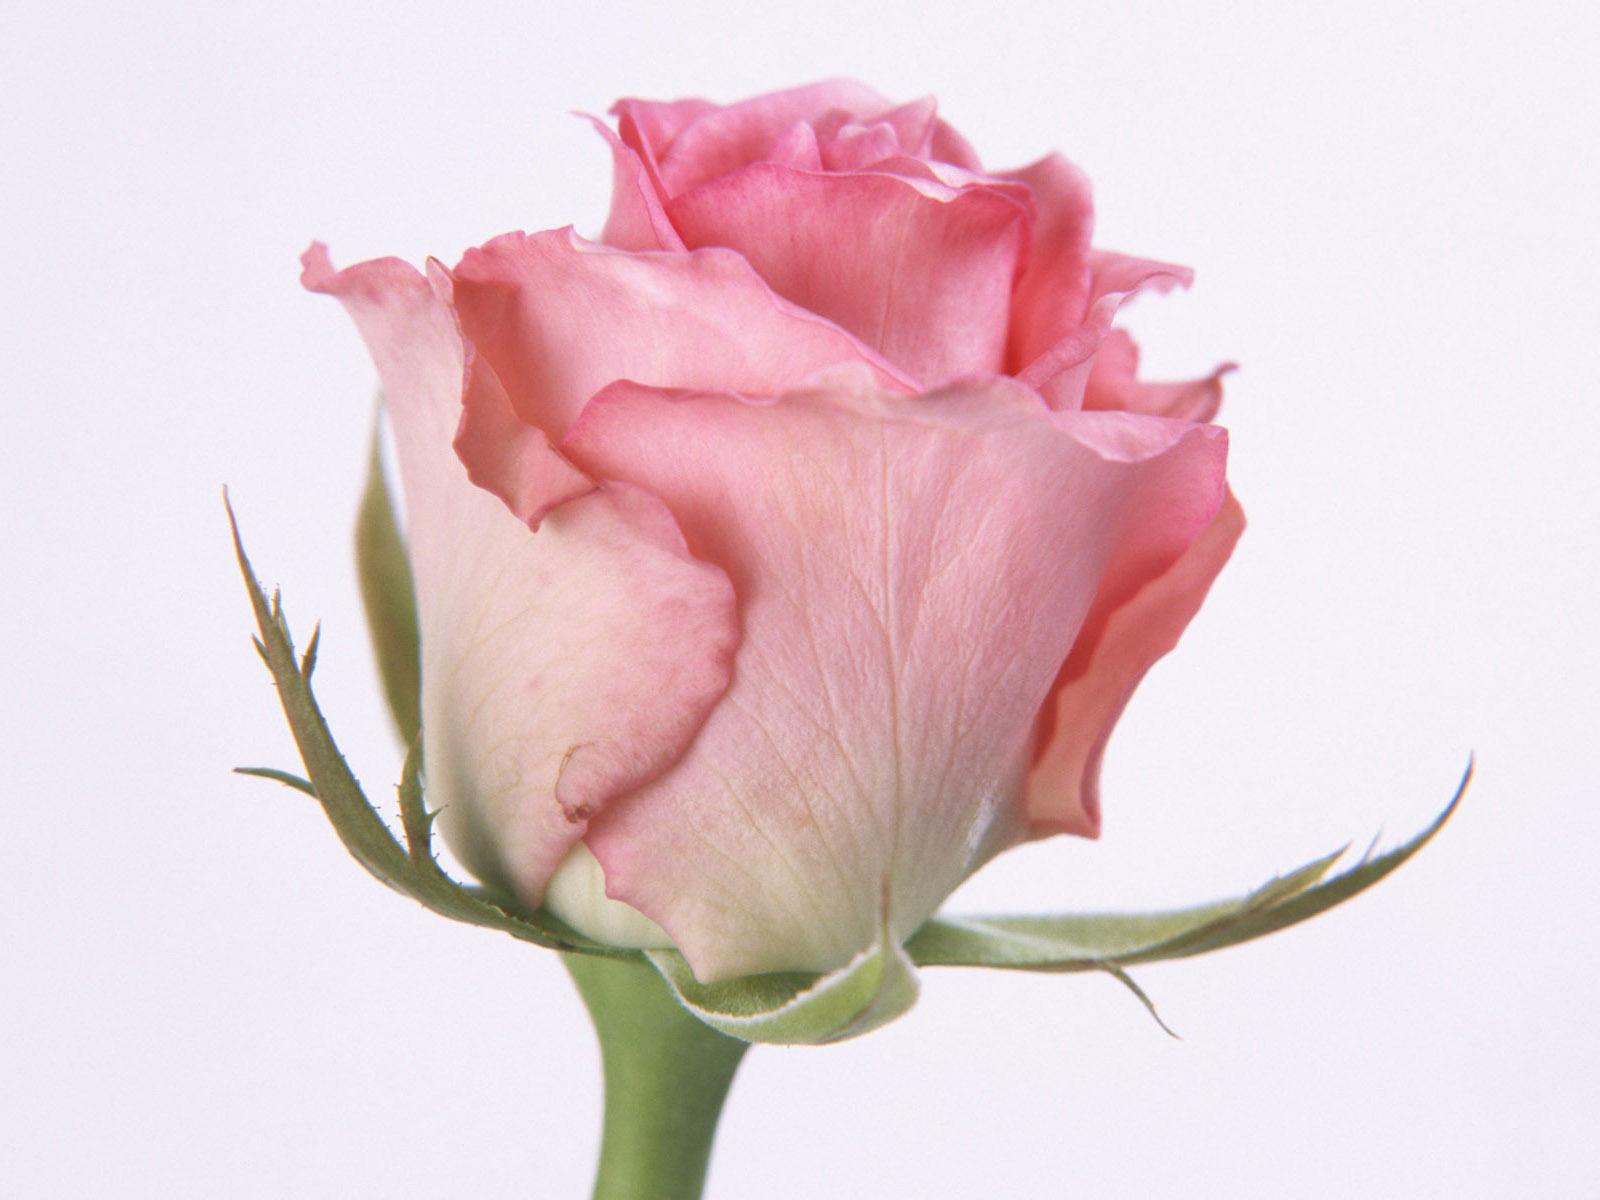 BABY PANDA BLOG: PINK ROSES for ROMANCE